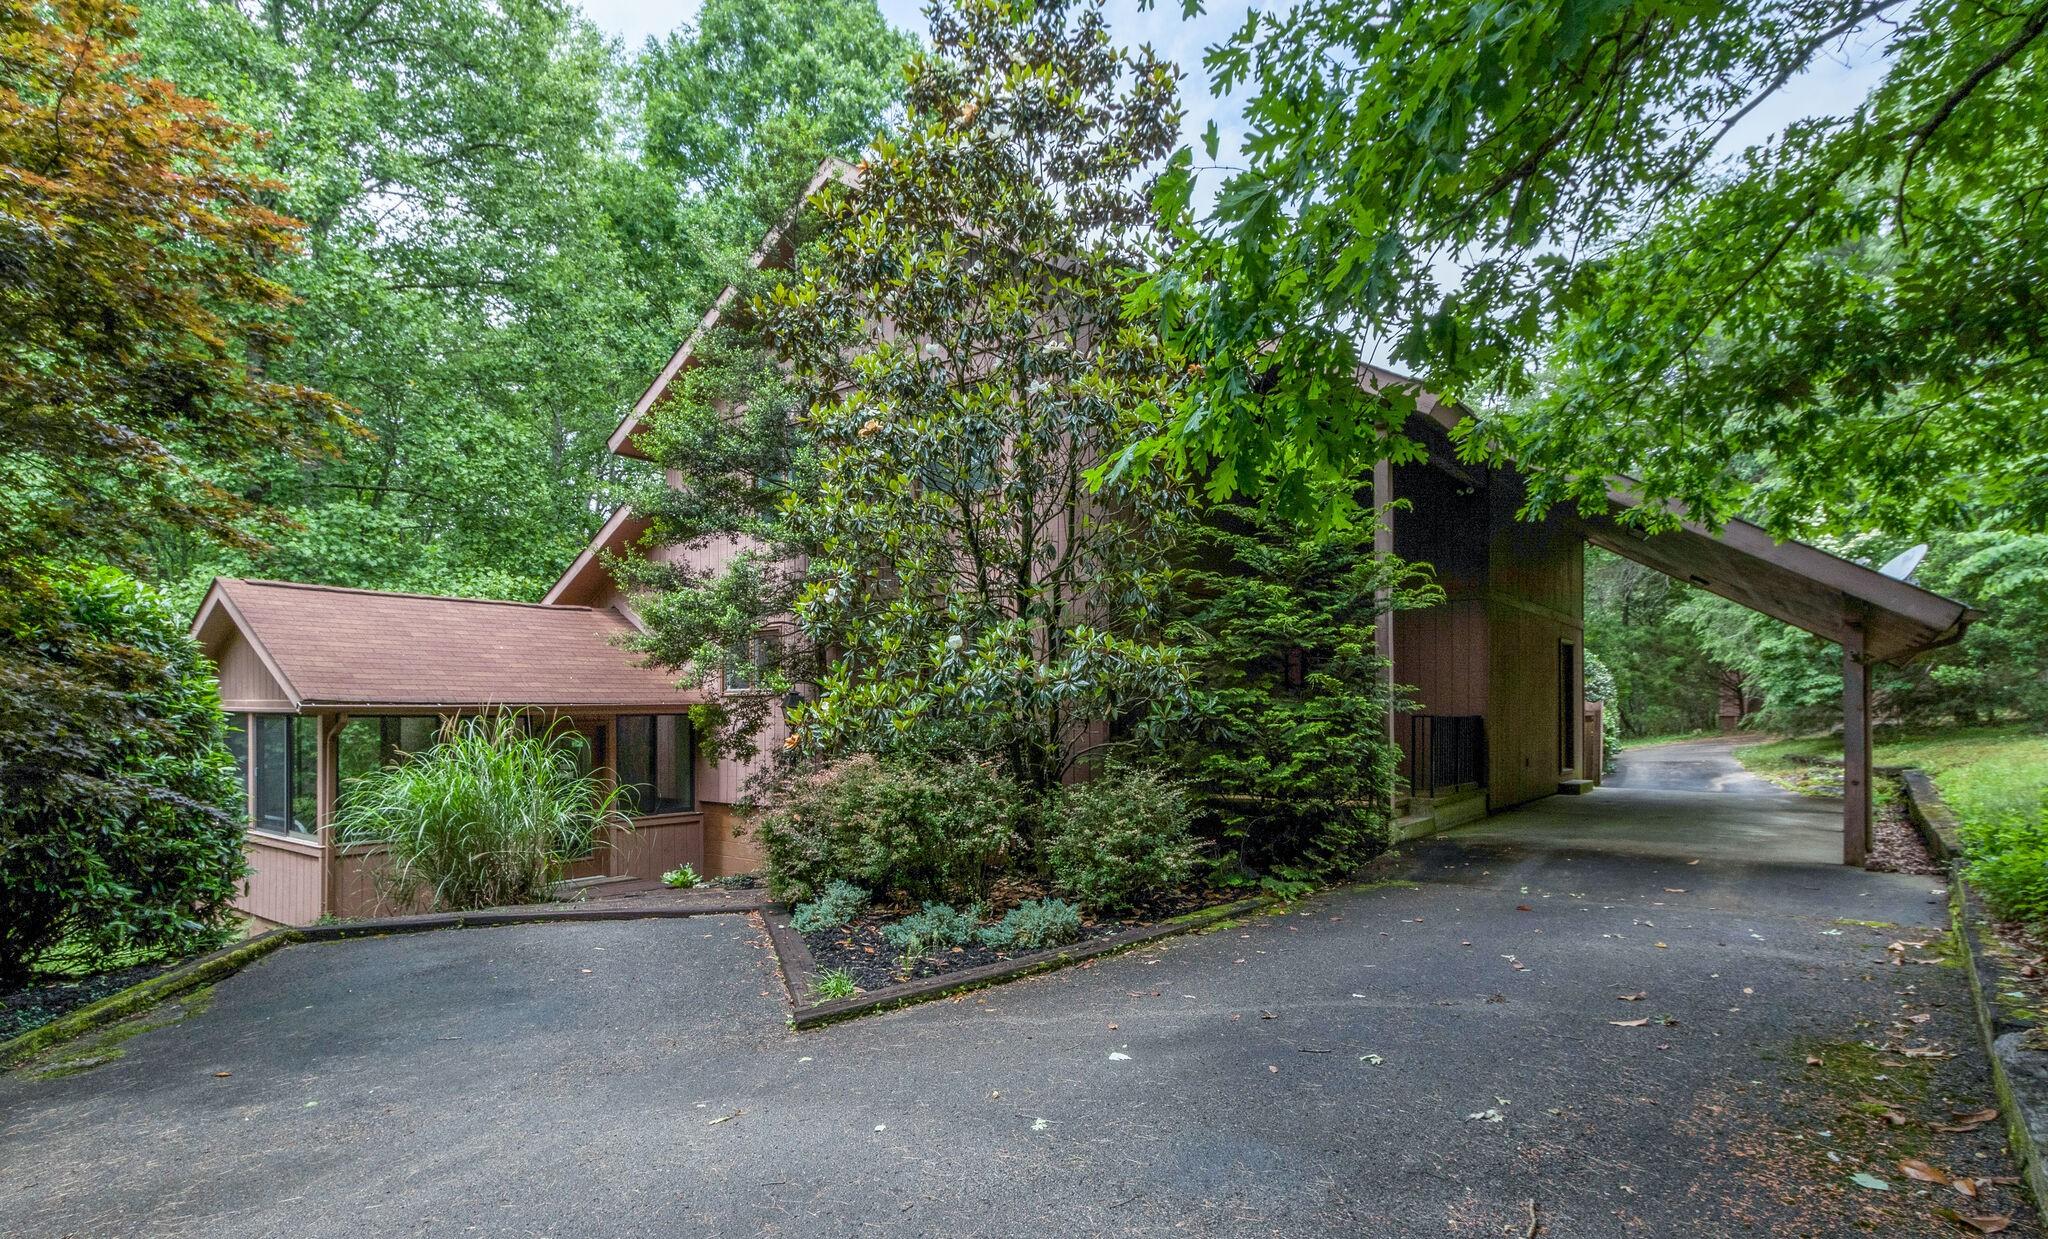 723 Dogwood Dr Property Photo - Monteagle, TN real estate listing